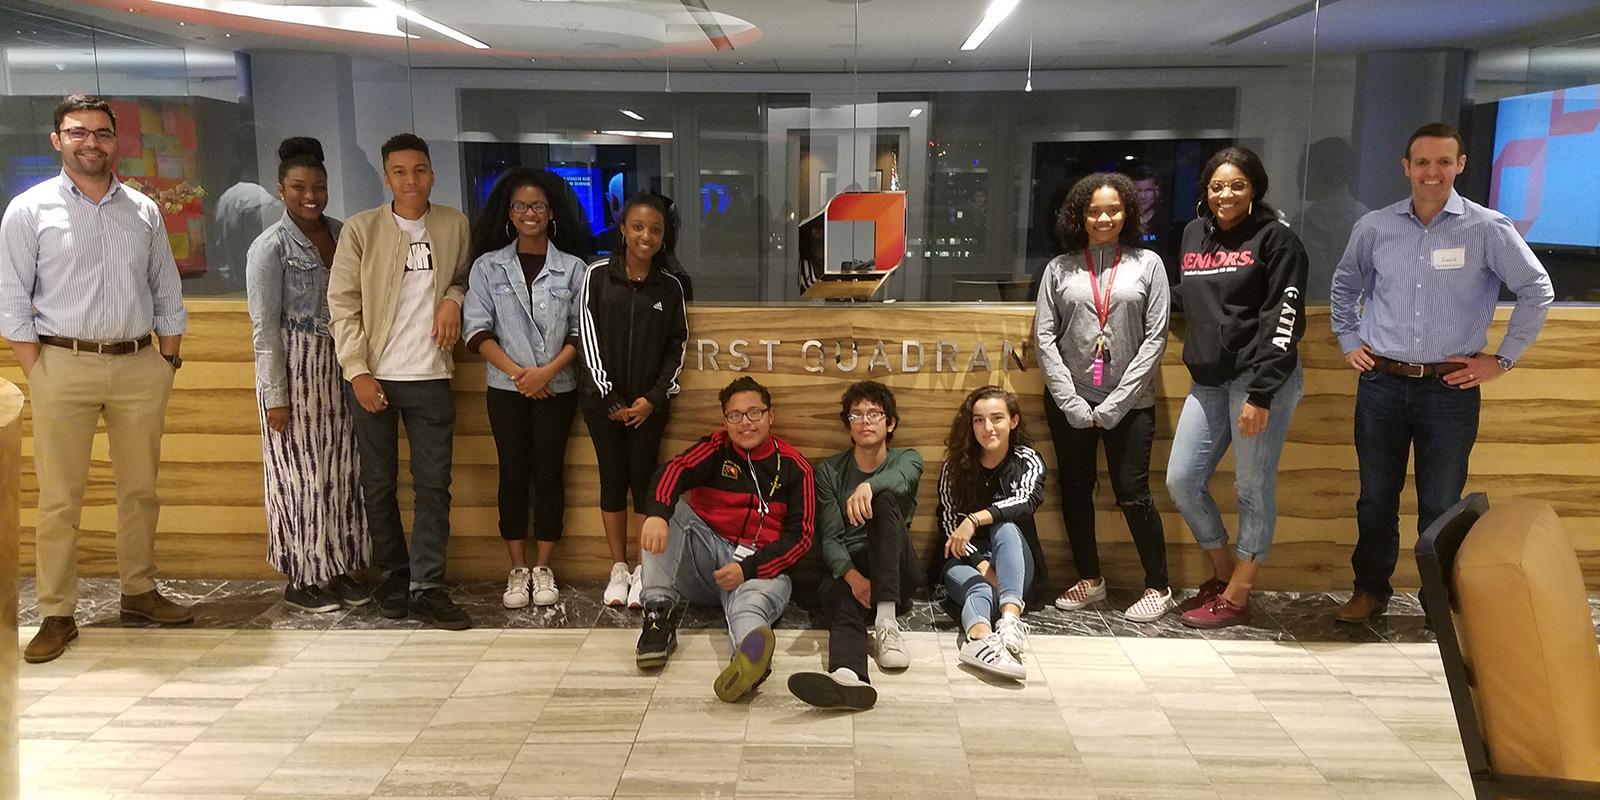 Youth Ambassadors at First Quadrant